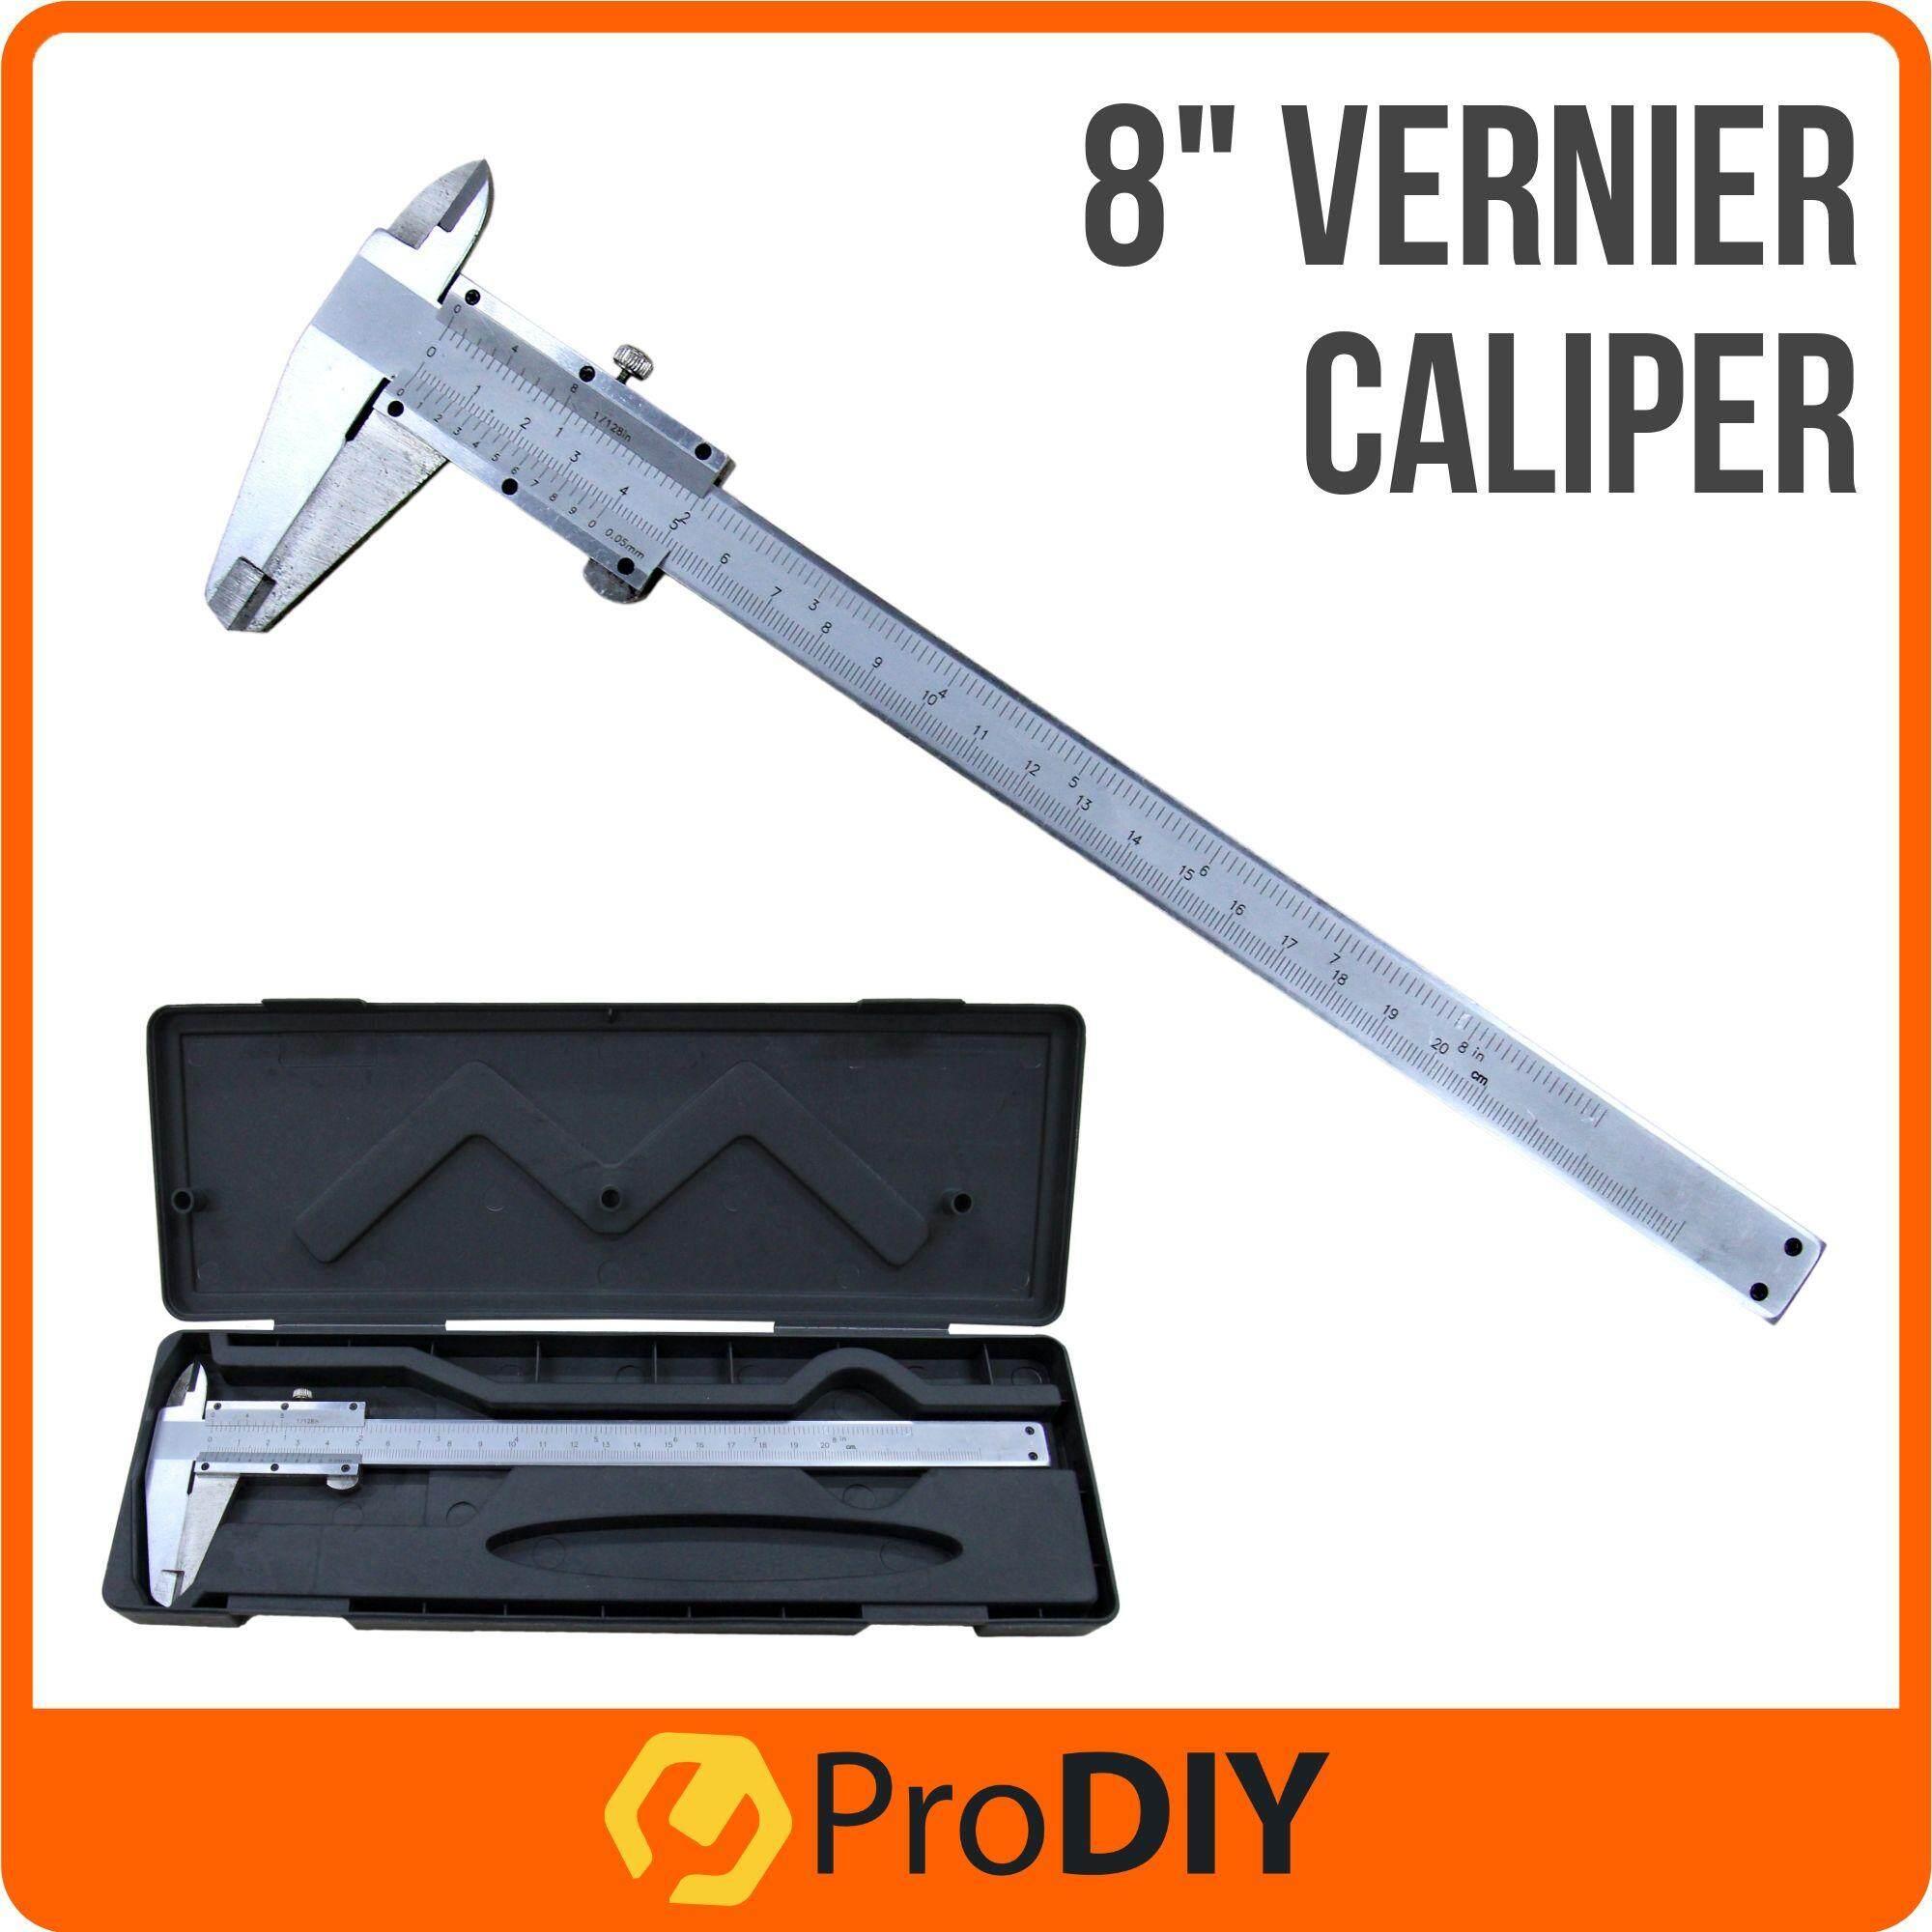 "2x Steel Divider Spring Caliper Measure Flat Leg Scribing Compasses 150mm//6/"""